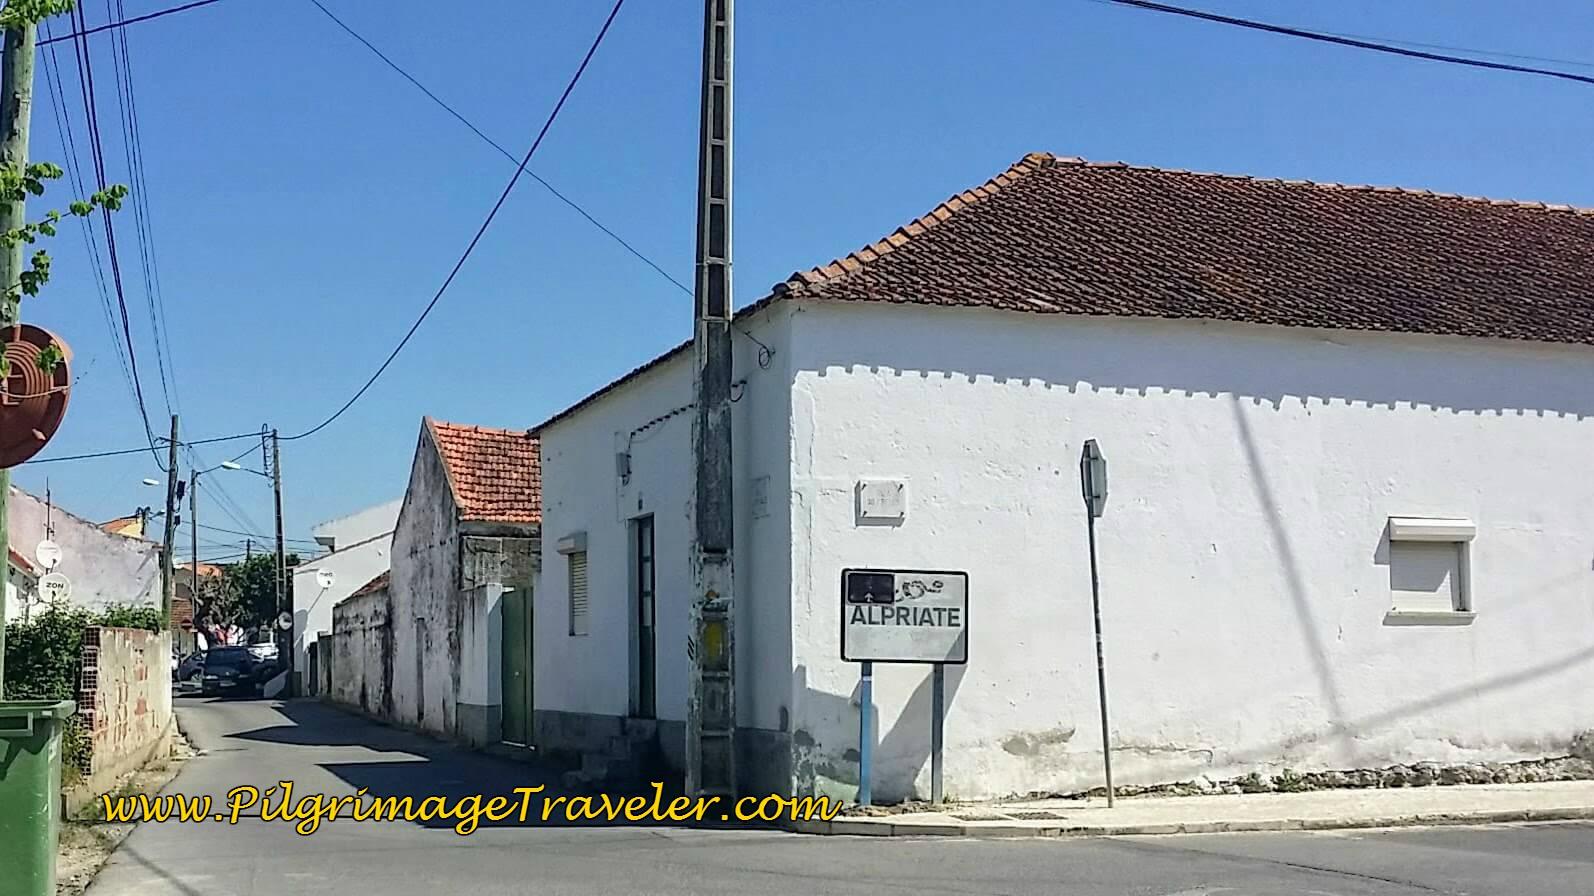 Entering Alpriate, Portugal